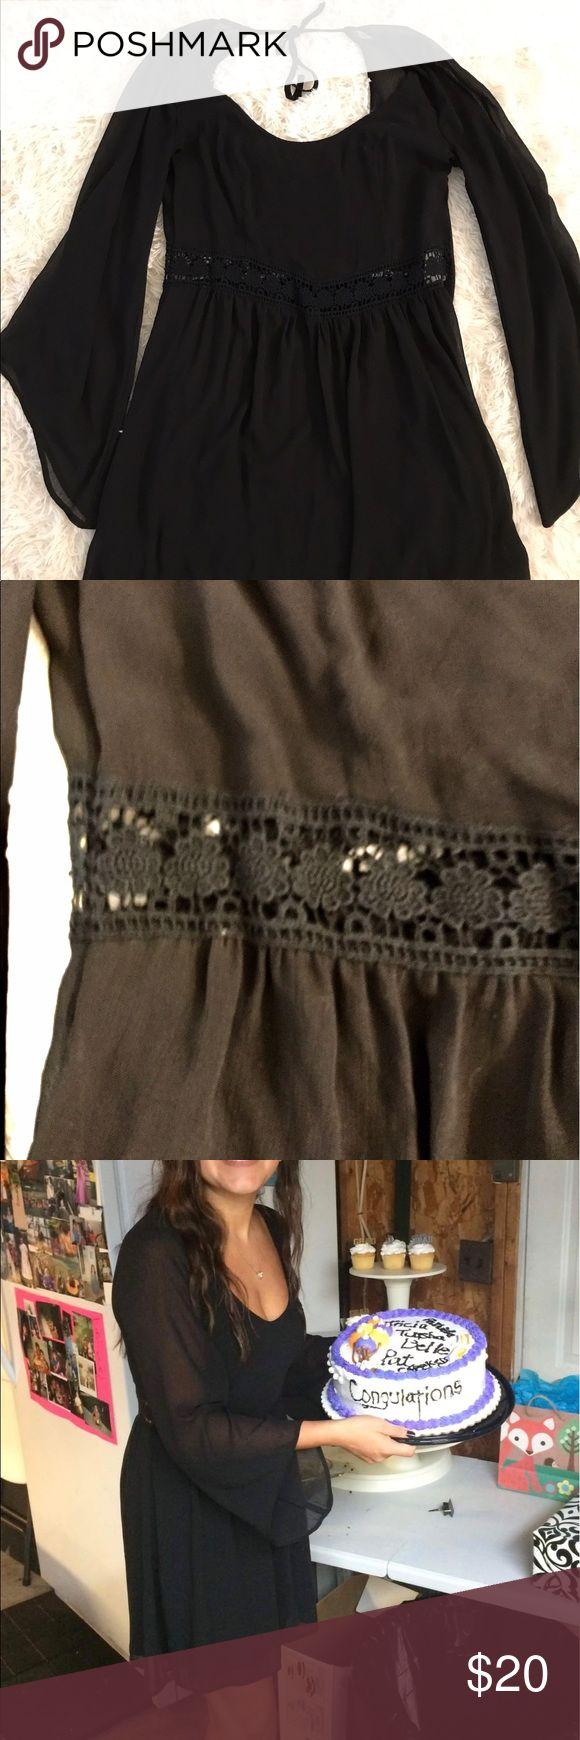 M black Hollister dress Pretty black Hollister dress. Used two times. Hollister Dresses Mini